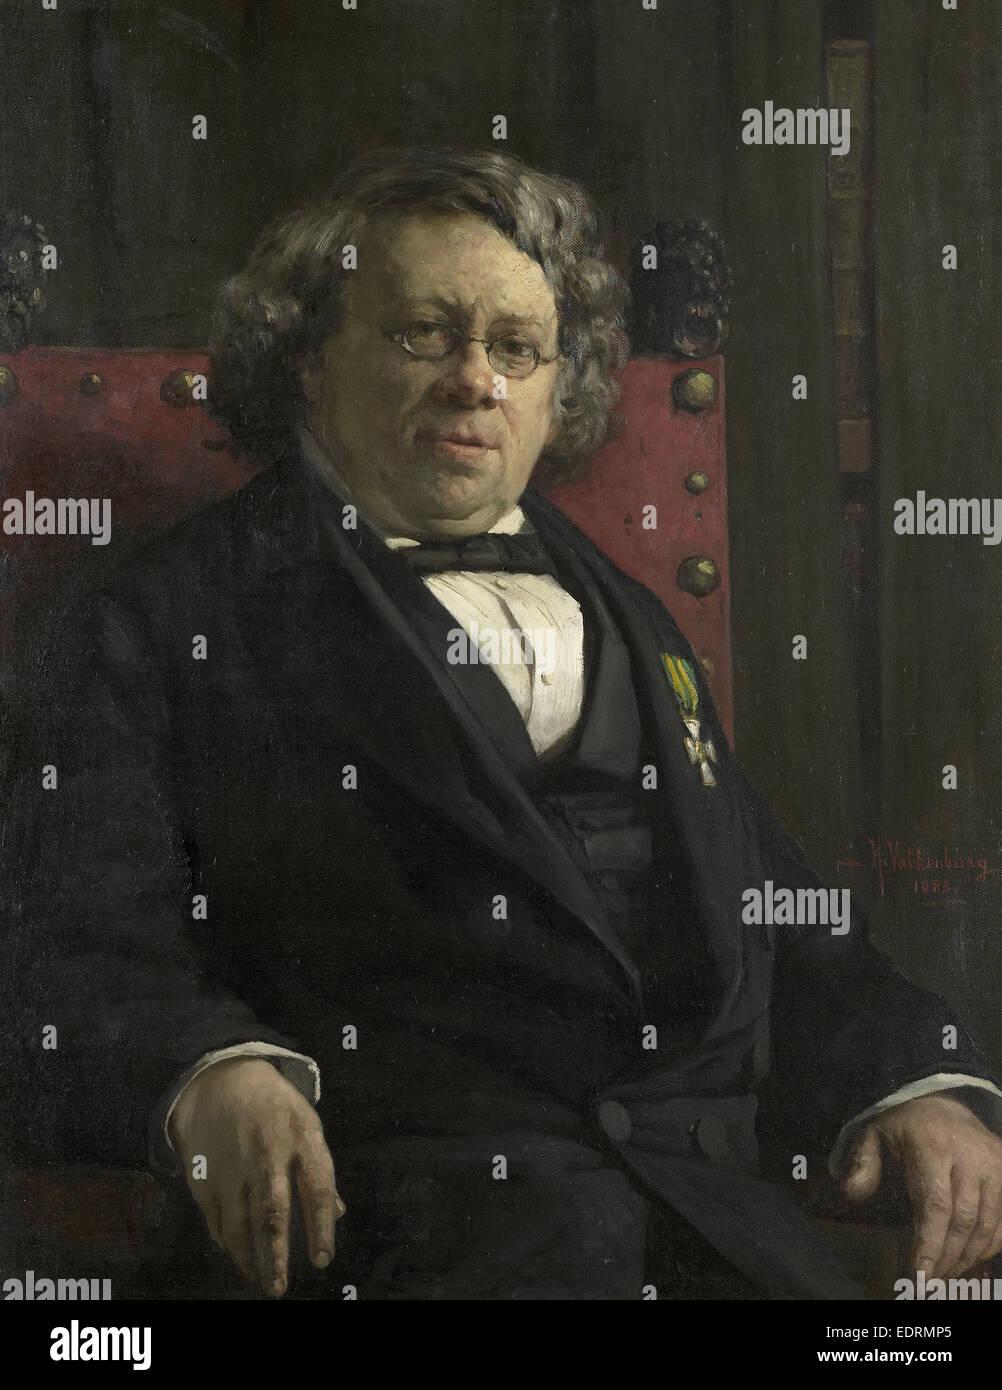 Pieter Harme Witkamp, 1816-92, Historian and geographer, Hendrik Valkenburg, 1883 - Stock Image